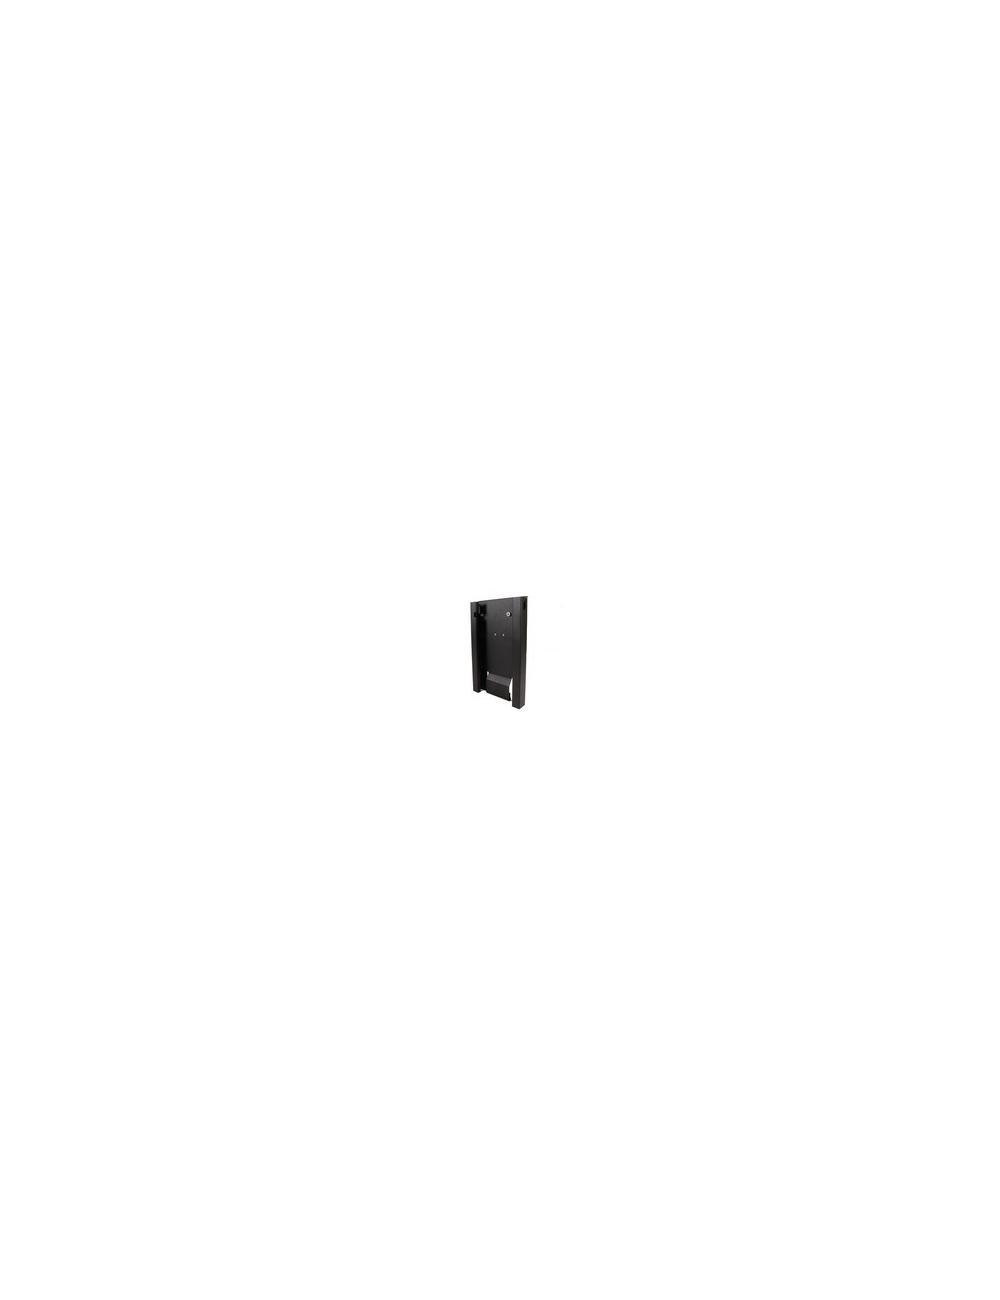 Litepanels - Hilio D12/T12 Floor Stand/Hanging Bracket for Power Supply